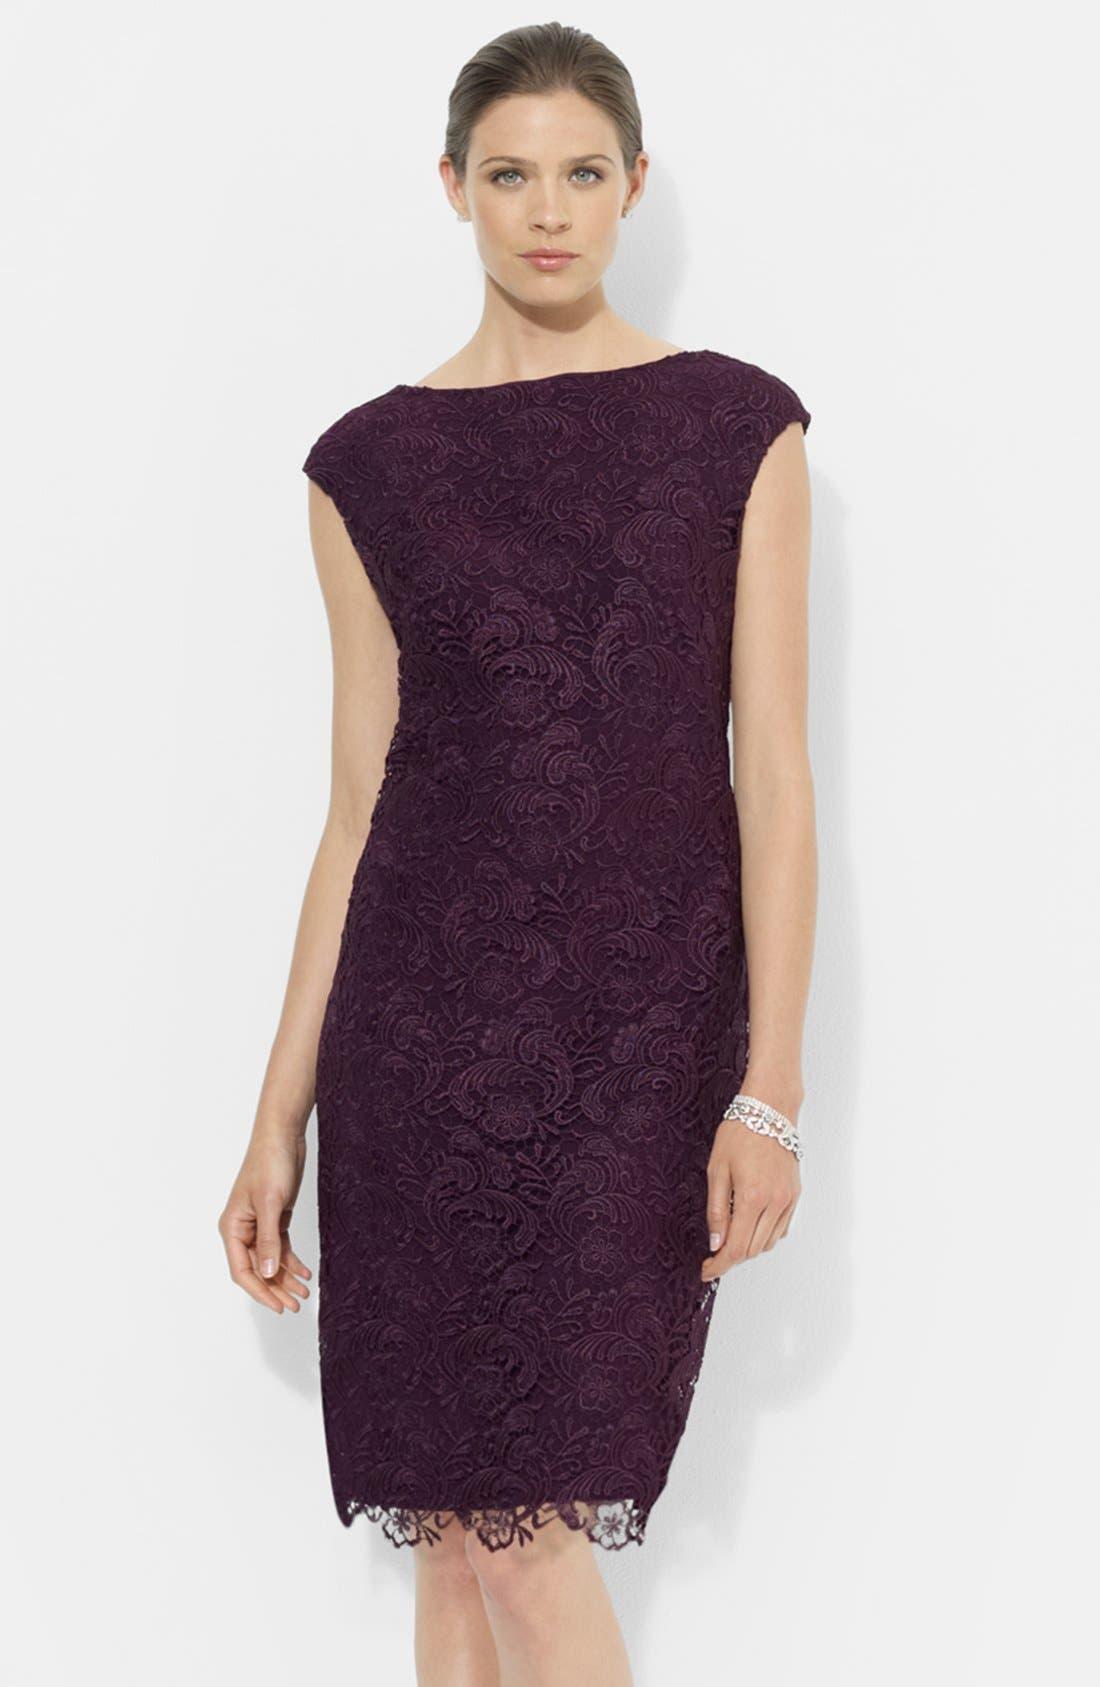 Alternate Image 1 Selected - Lauren Ralph Lauren Lace Sheath Dress (Petite)